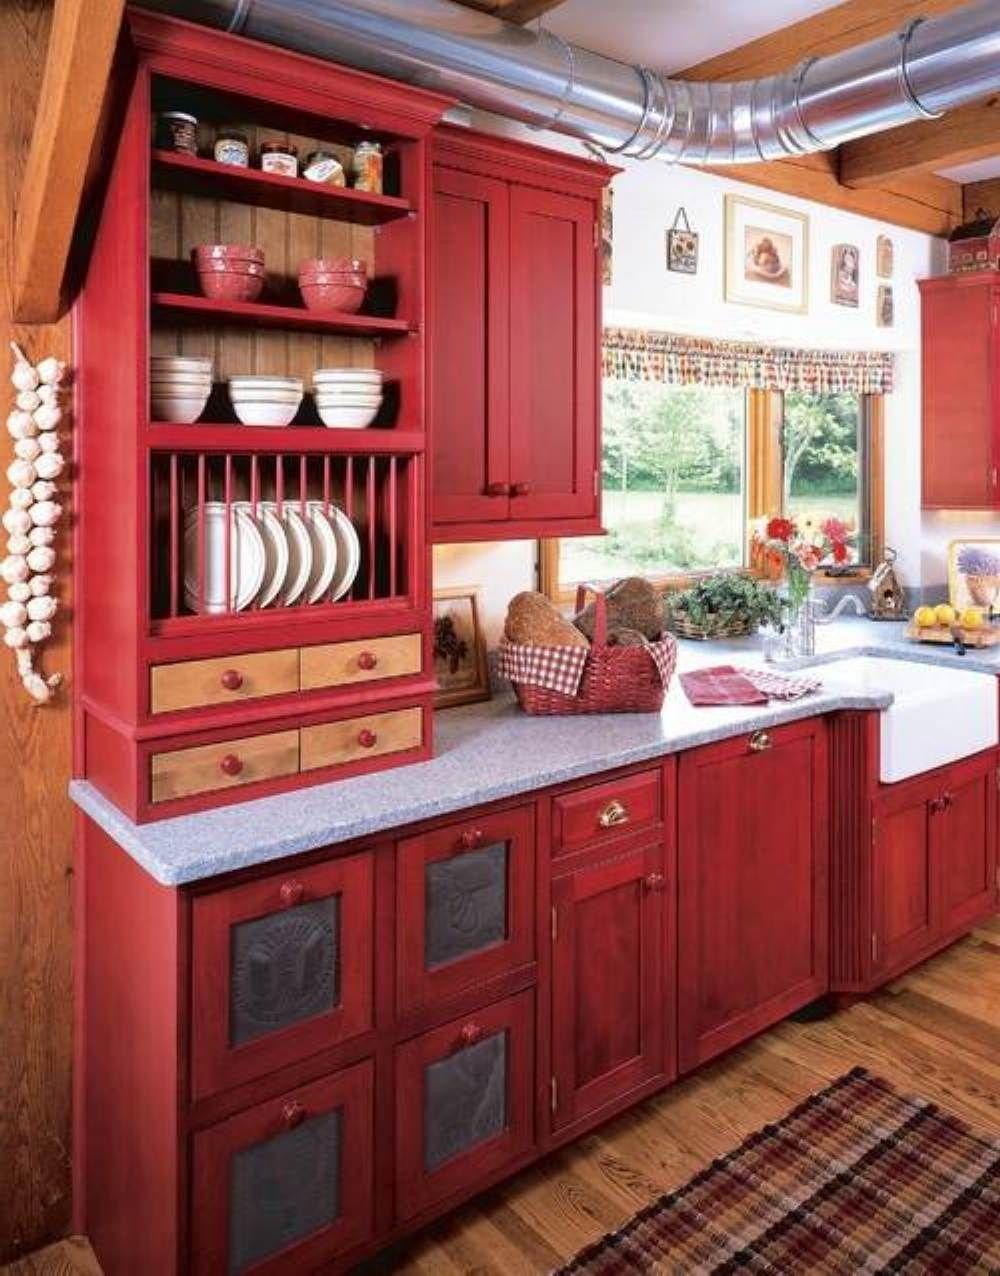 A Modern Kitchen Pays More Attention To Unique Design Details